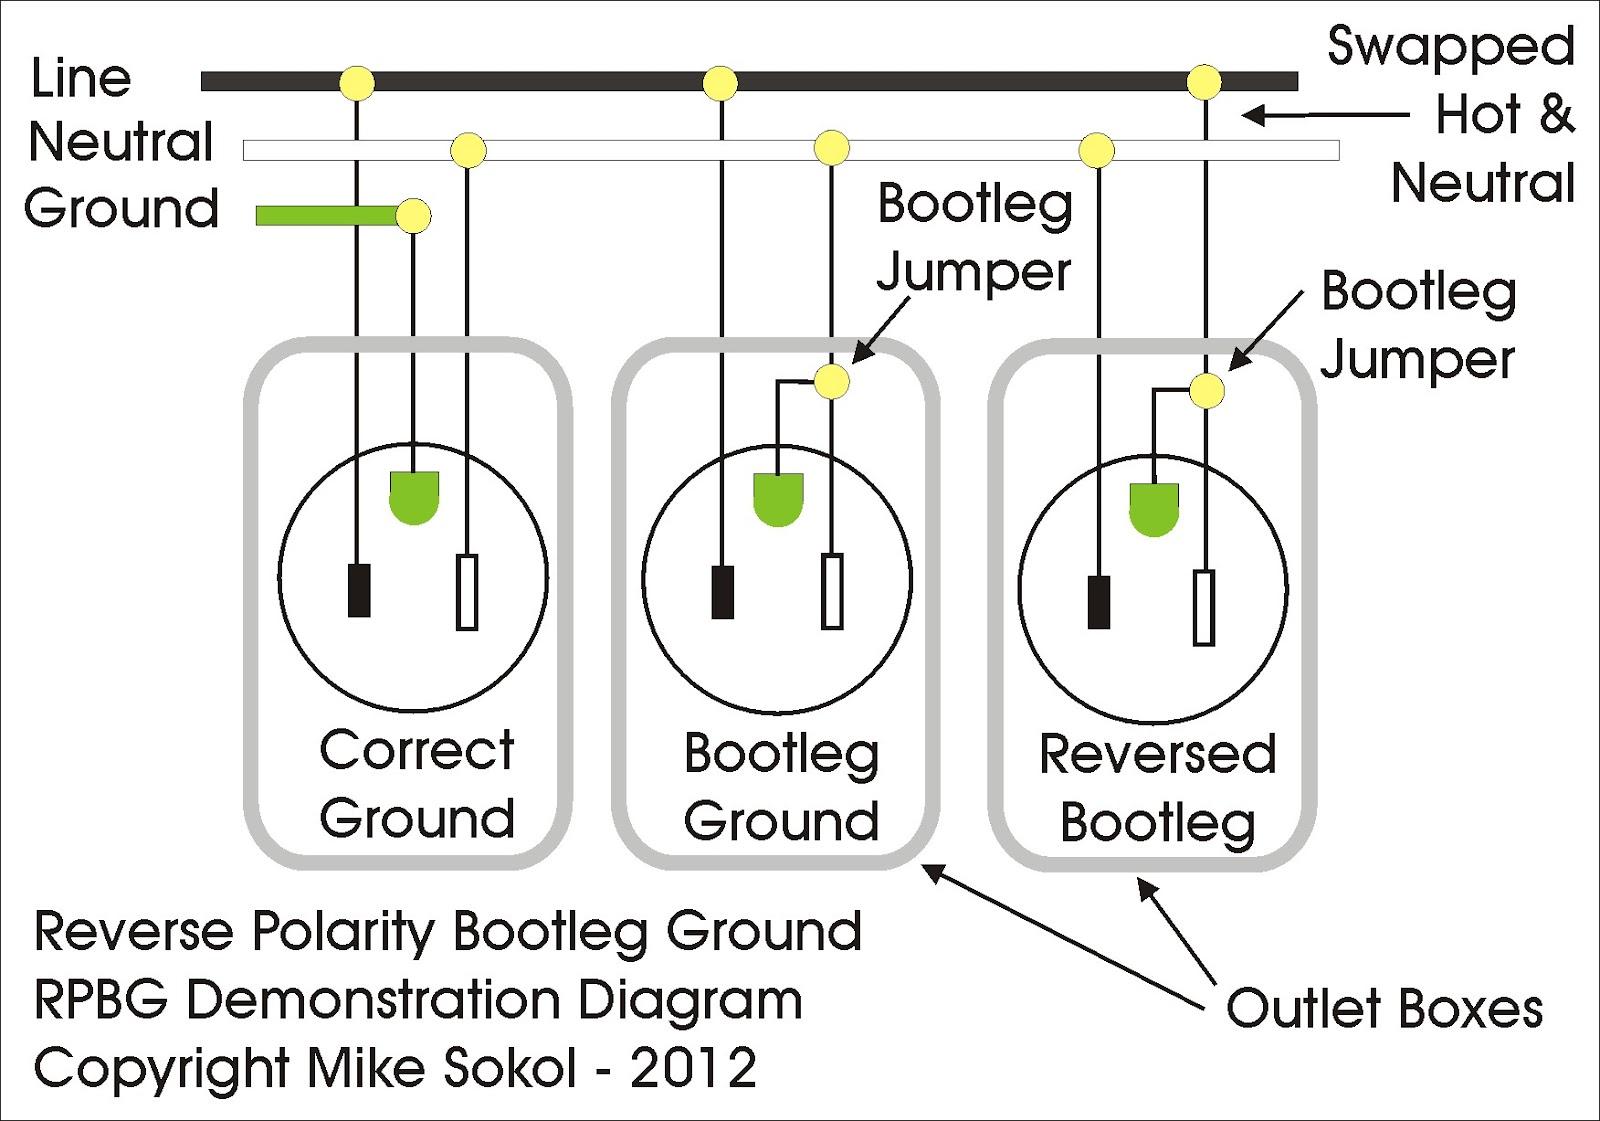 quad receptacle wiring diagram fujitsu ductless starcraft pop up camper get